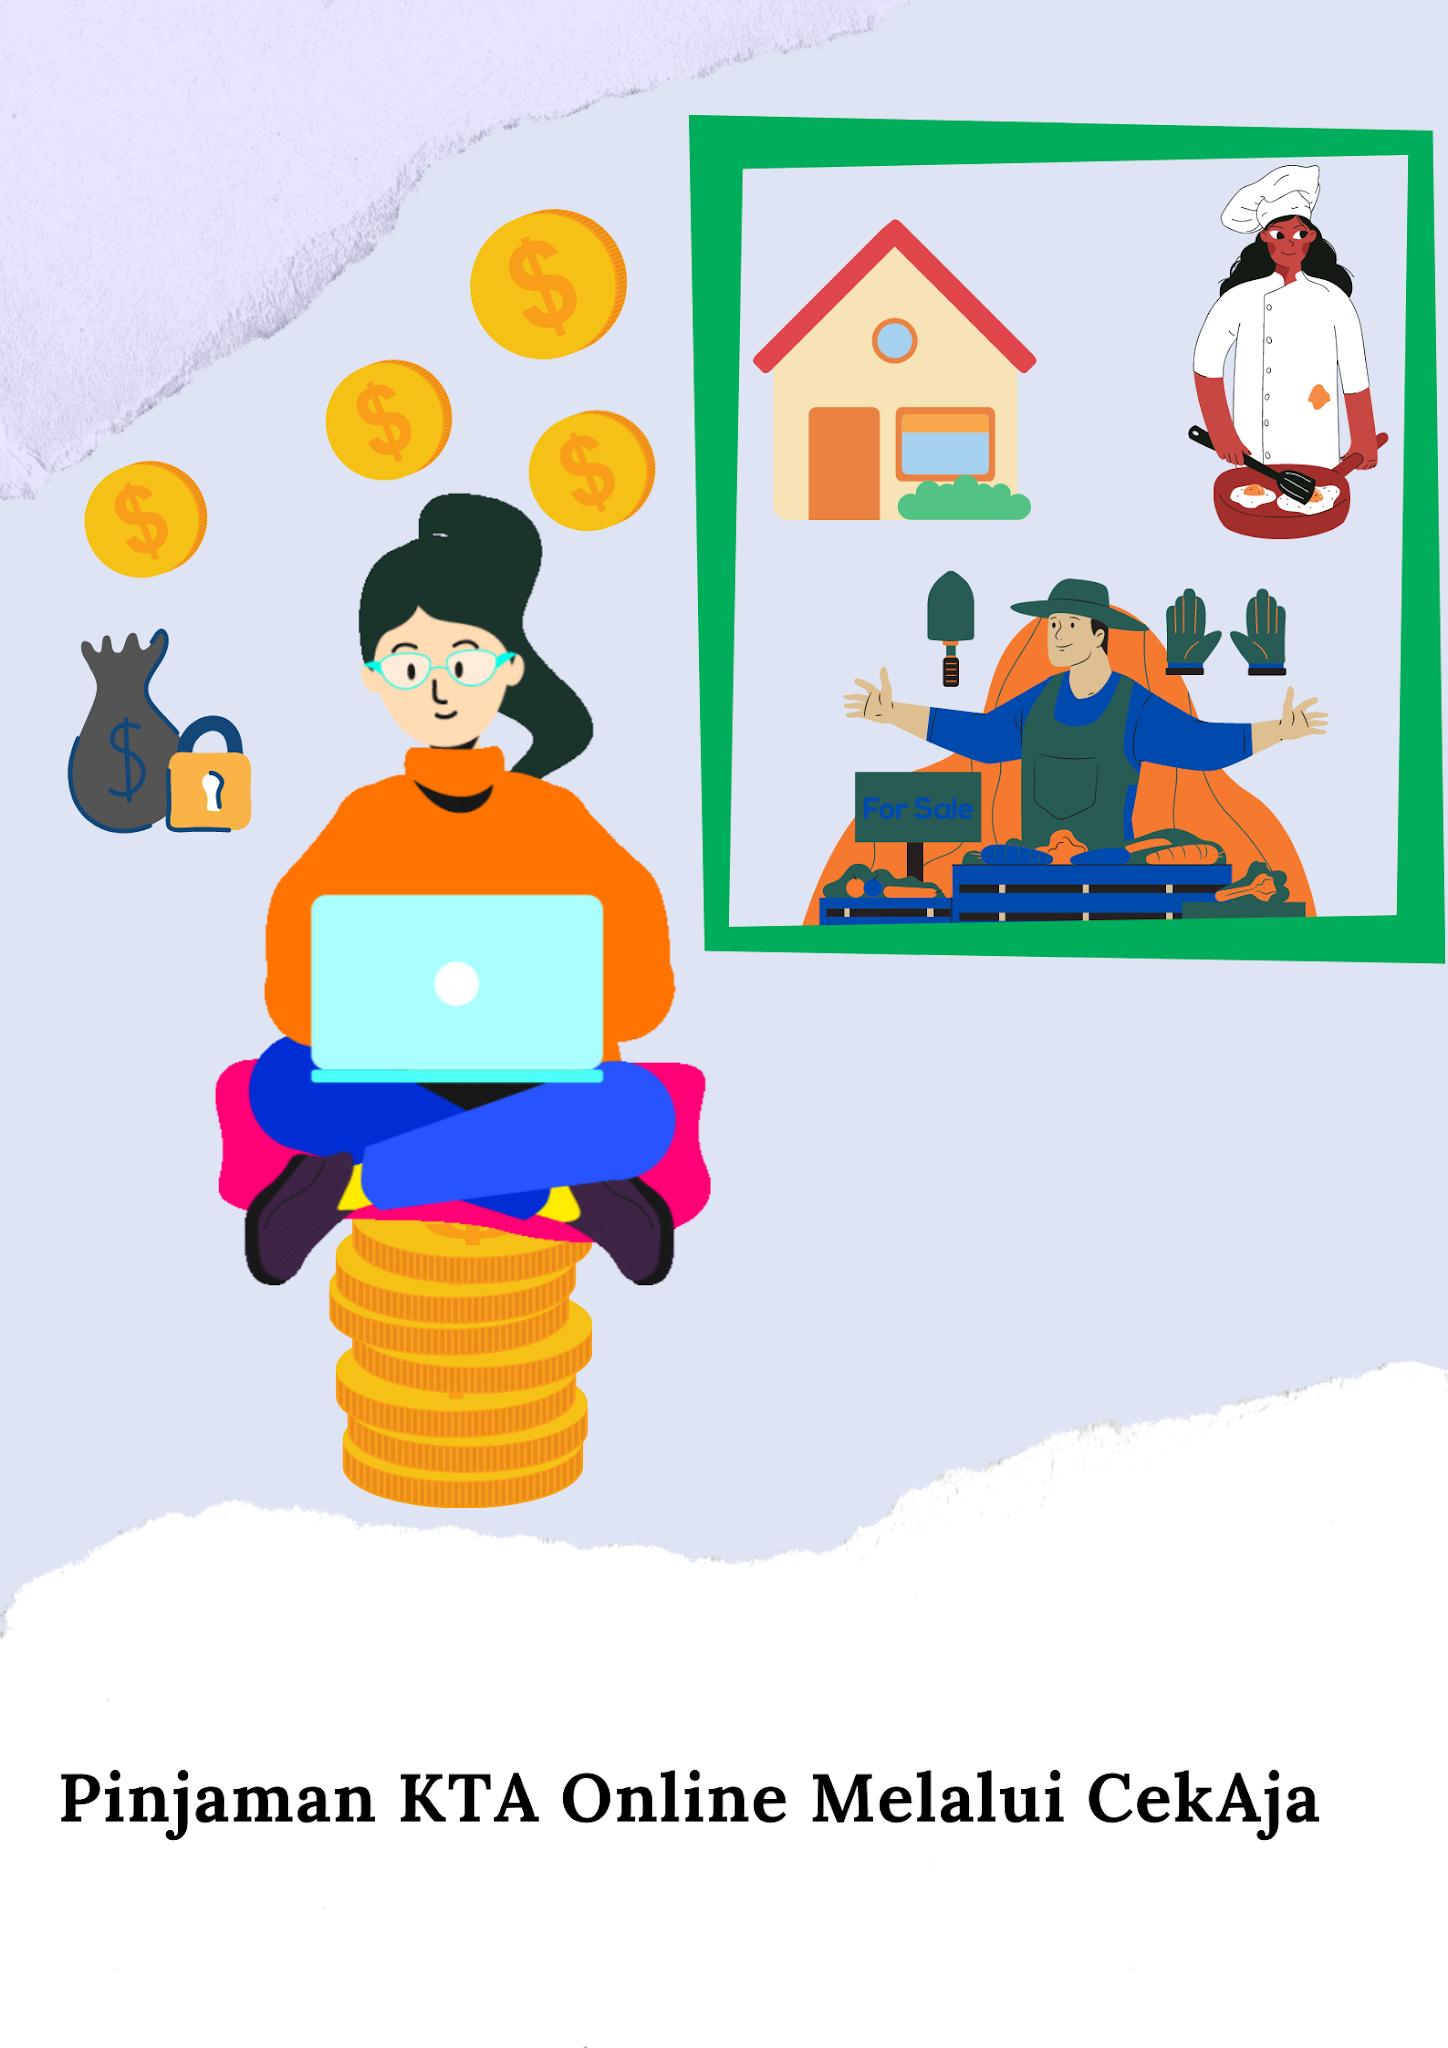 peminjaman KTA online